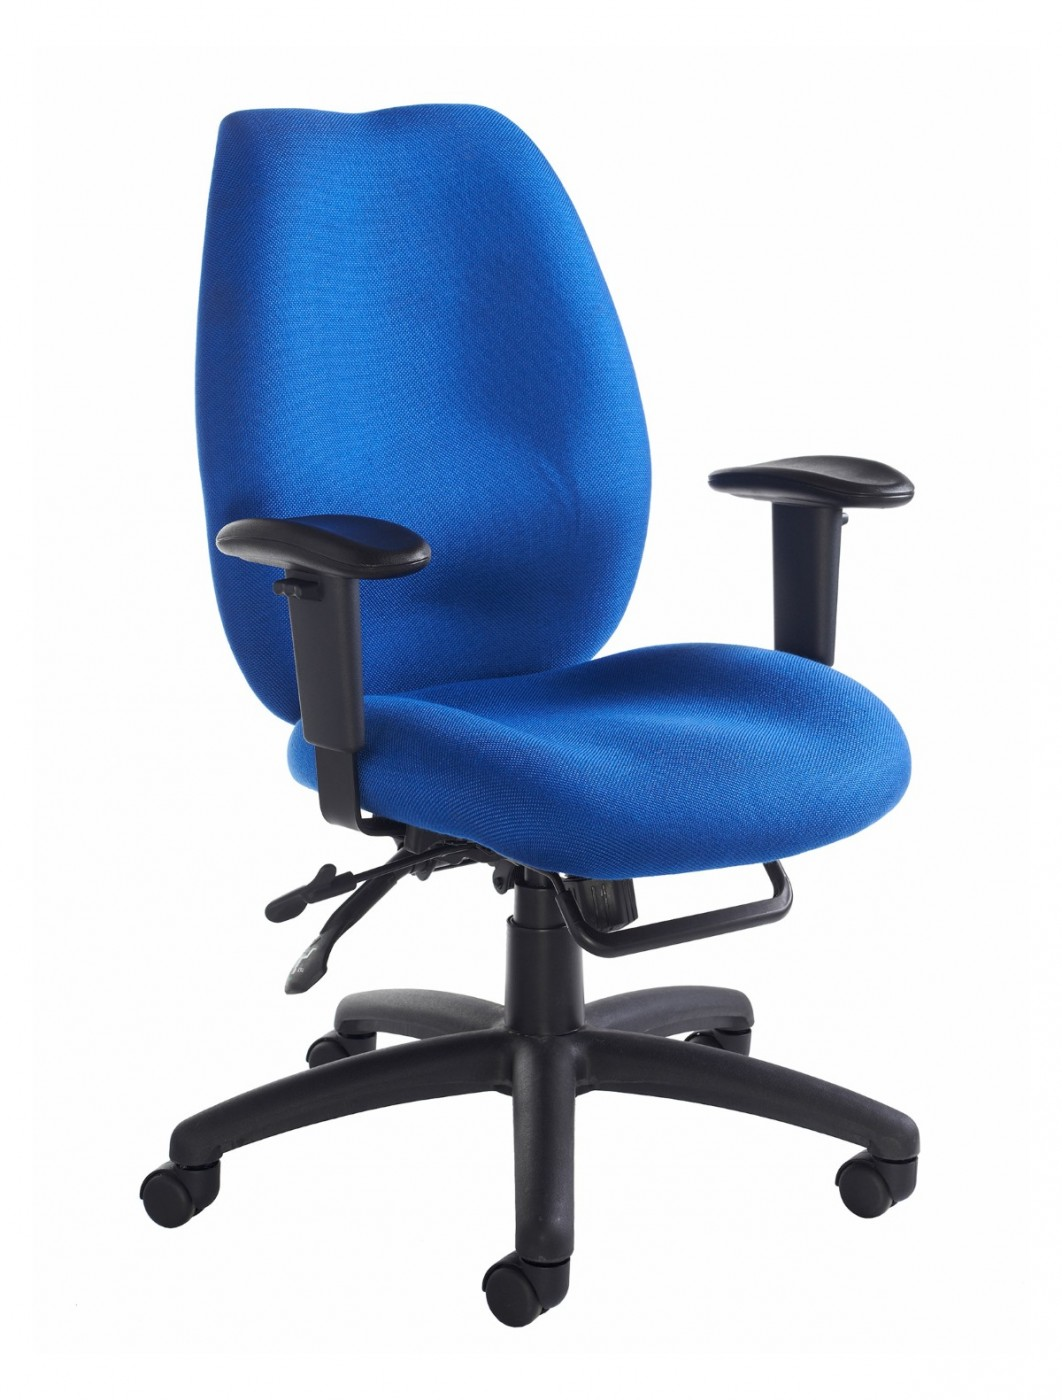 Office Chairs  Cornwall Fabric Operators Chair CWL300K2